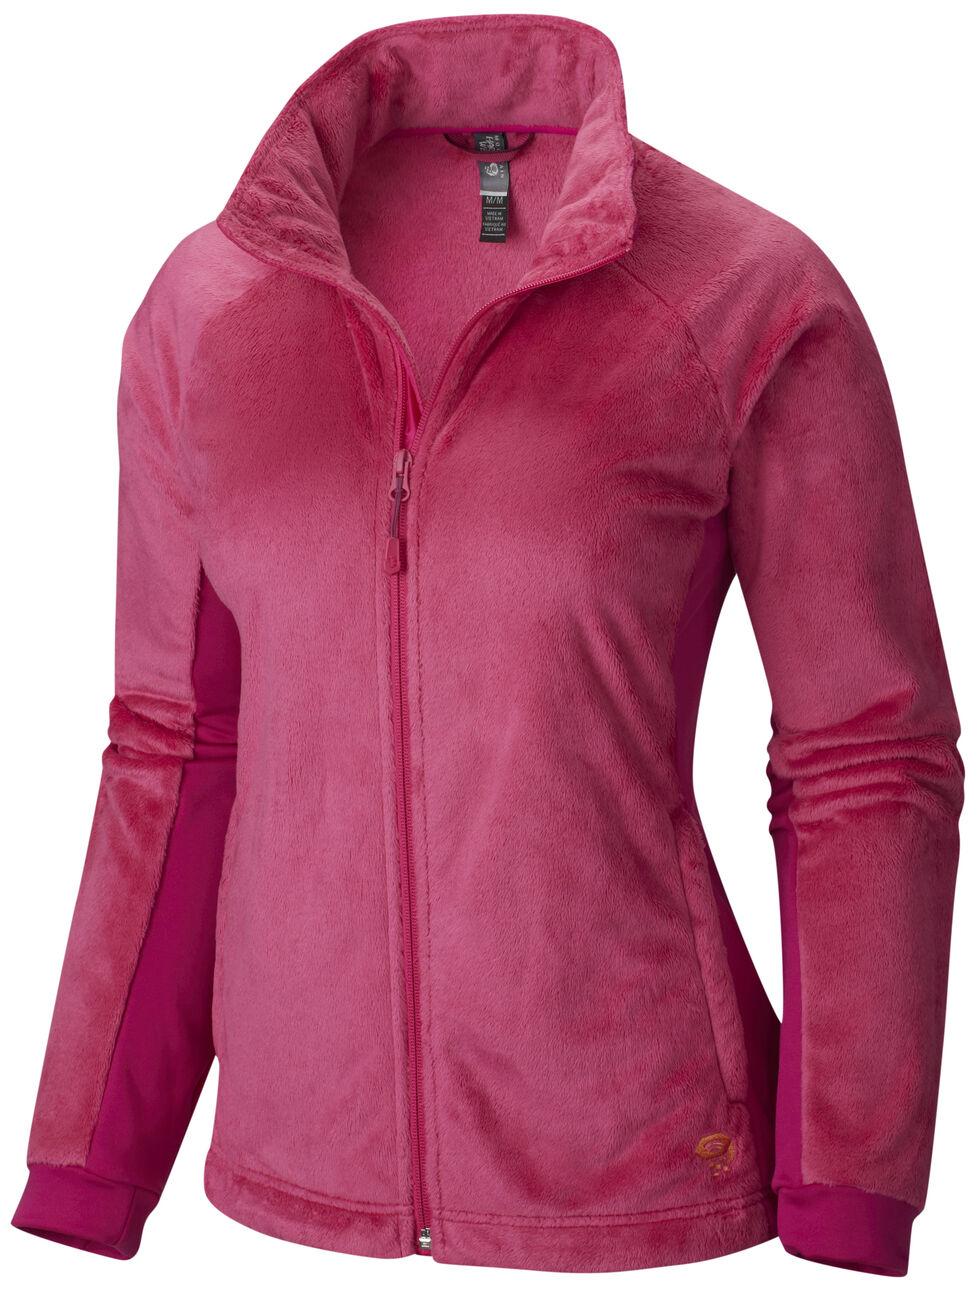 Mountain Hardwear Women's Pyxis Stretch Jacket, Pink, hi-res